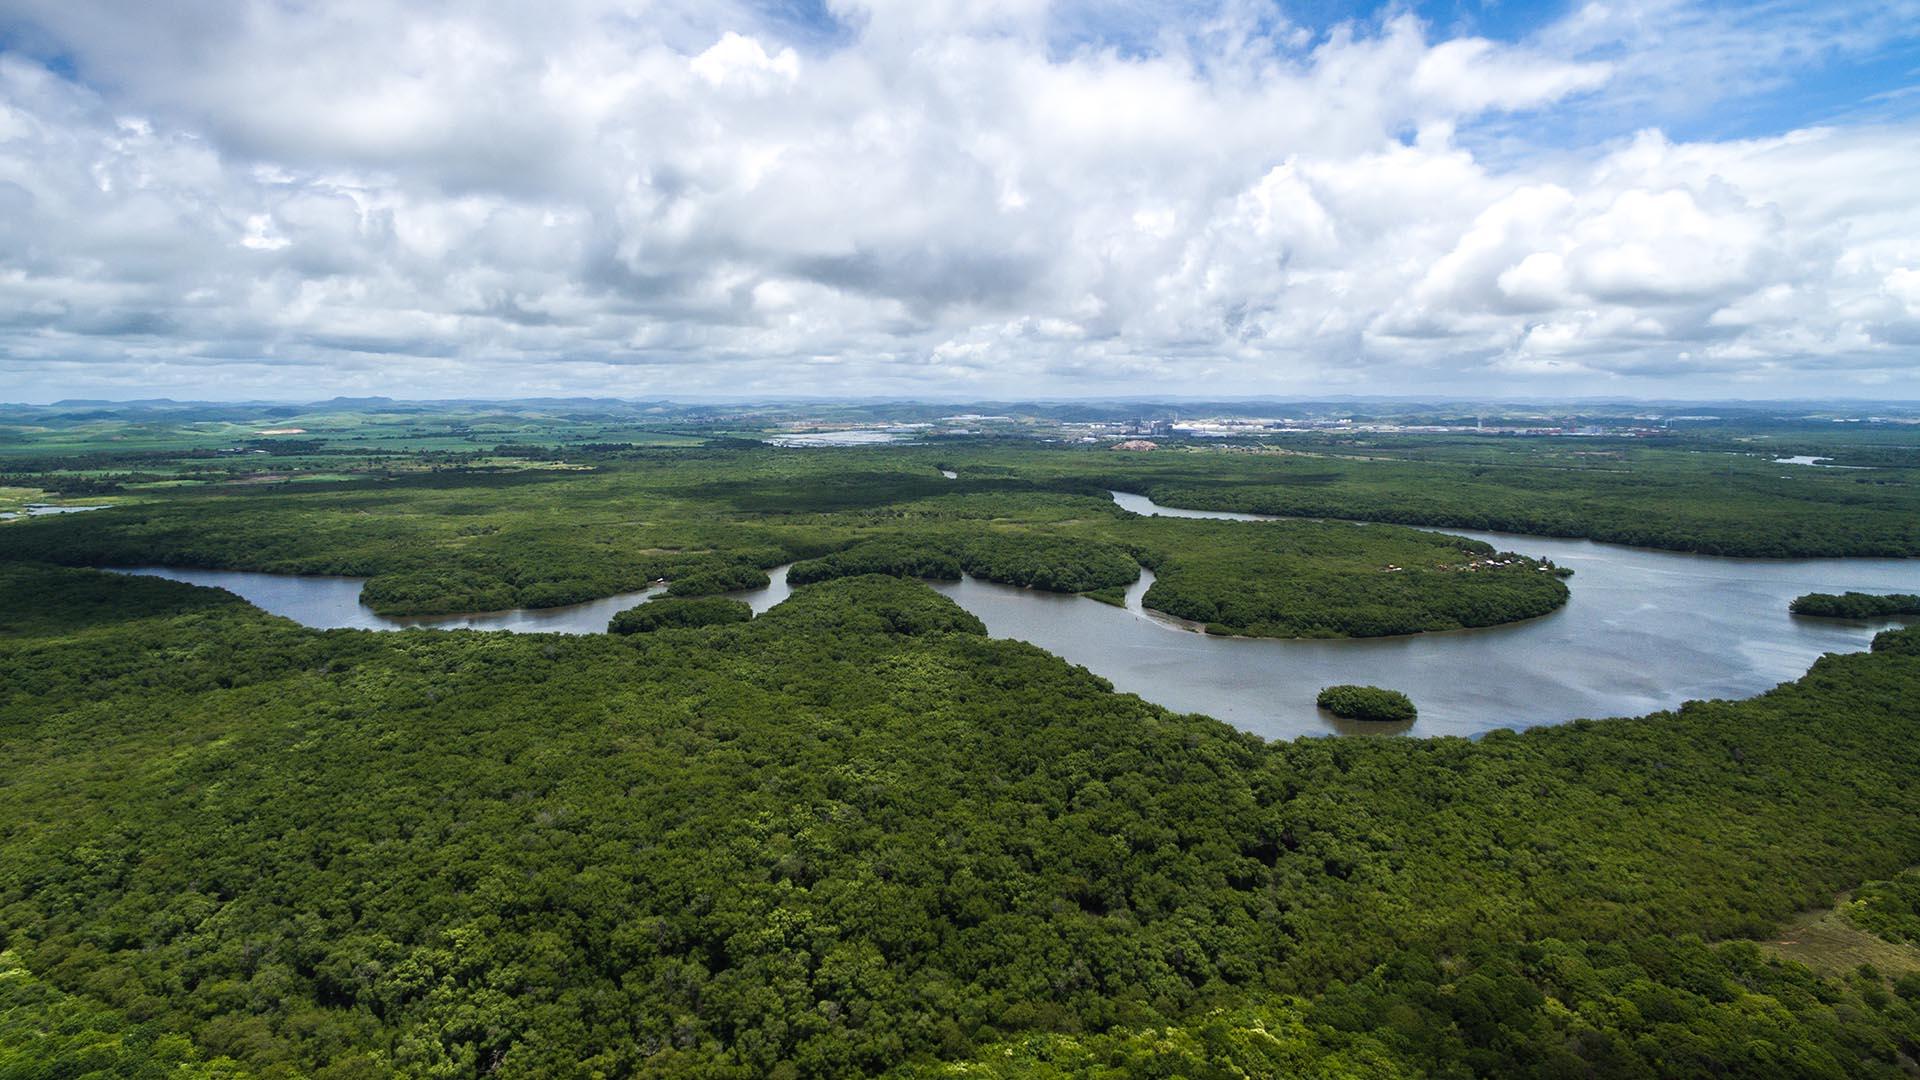 Amazonas River segment in the metropolitan region of Manaus (AM)